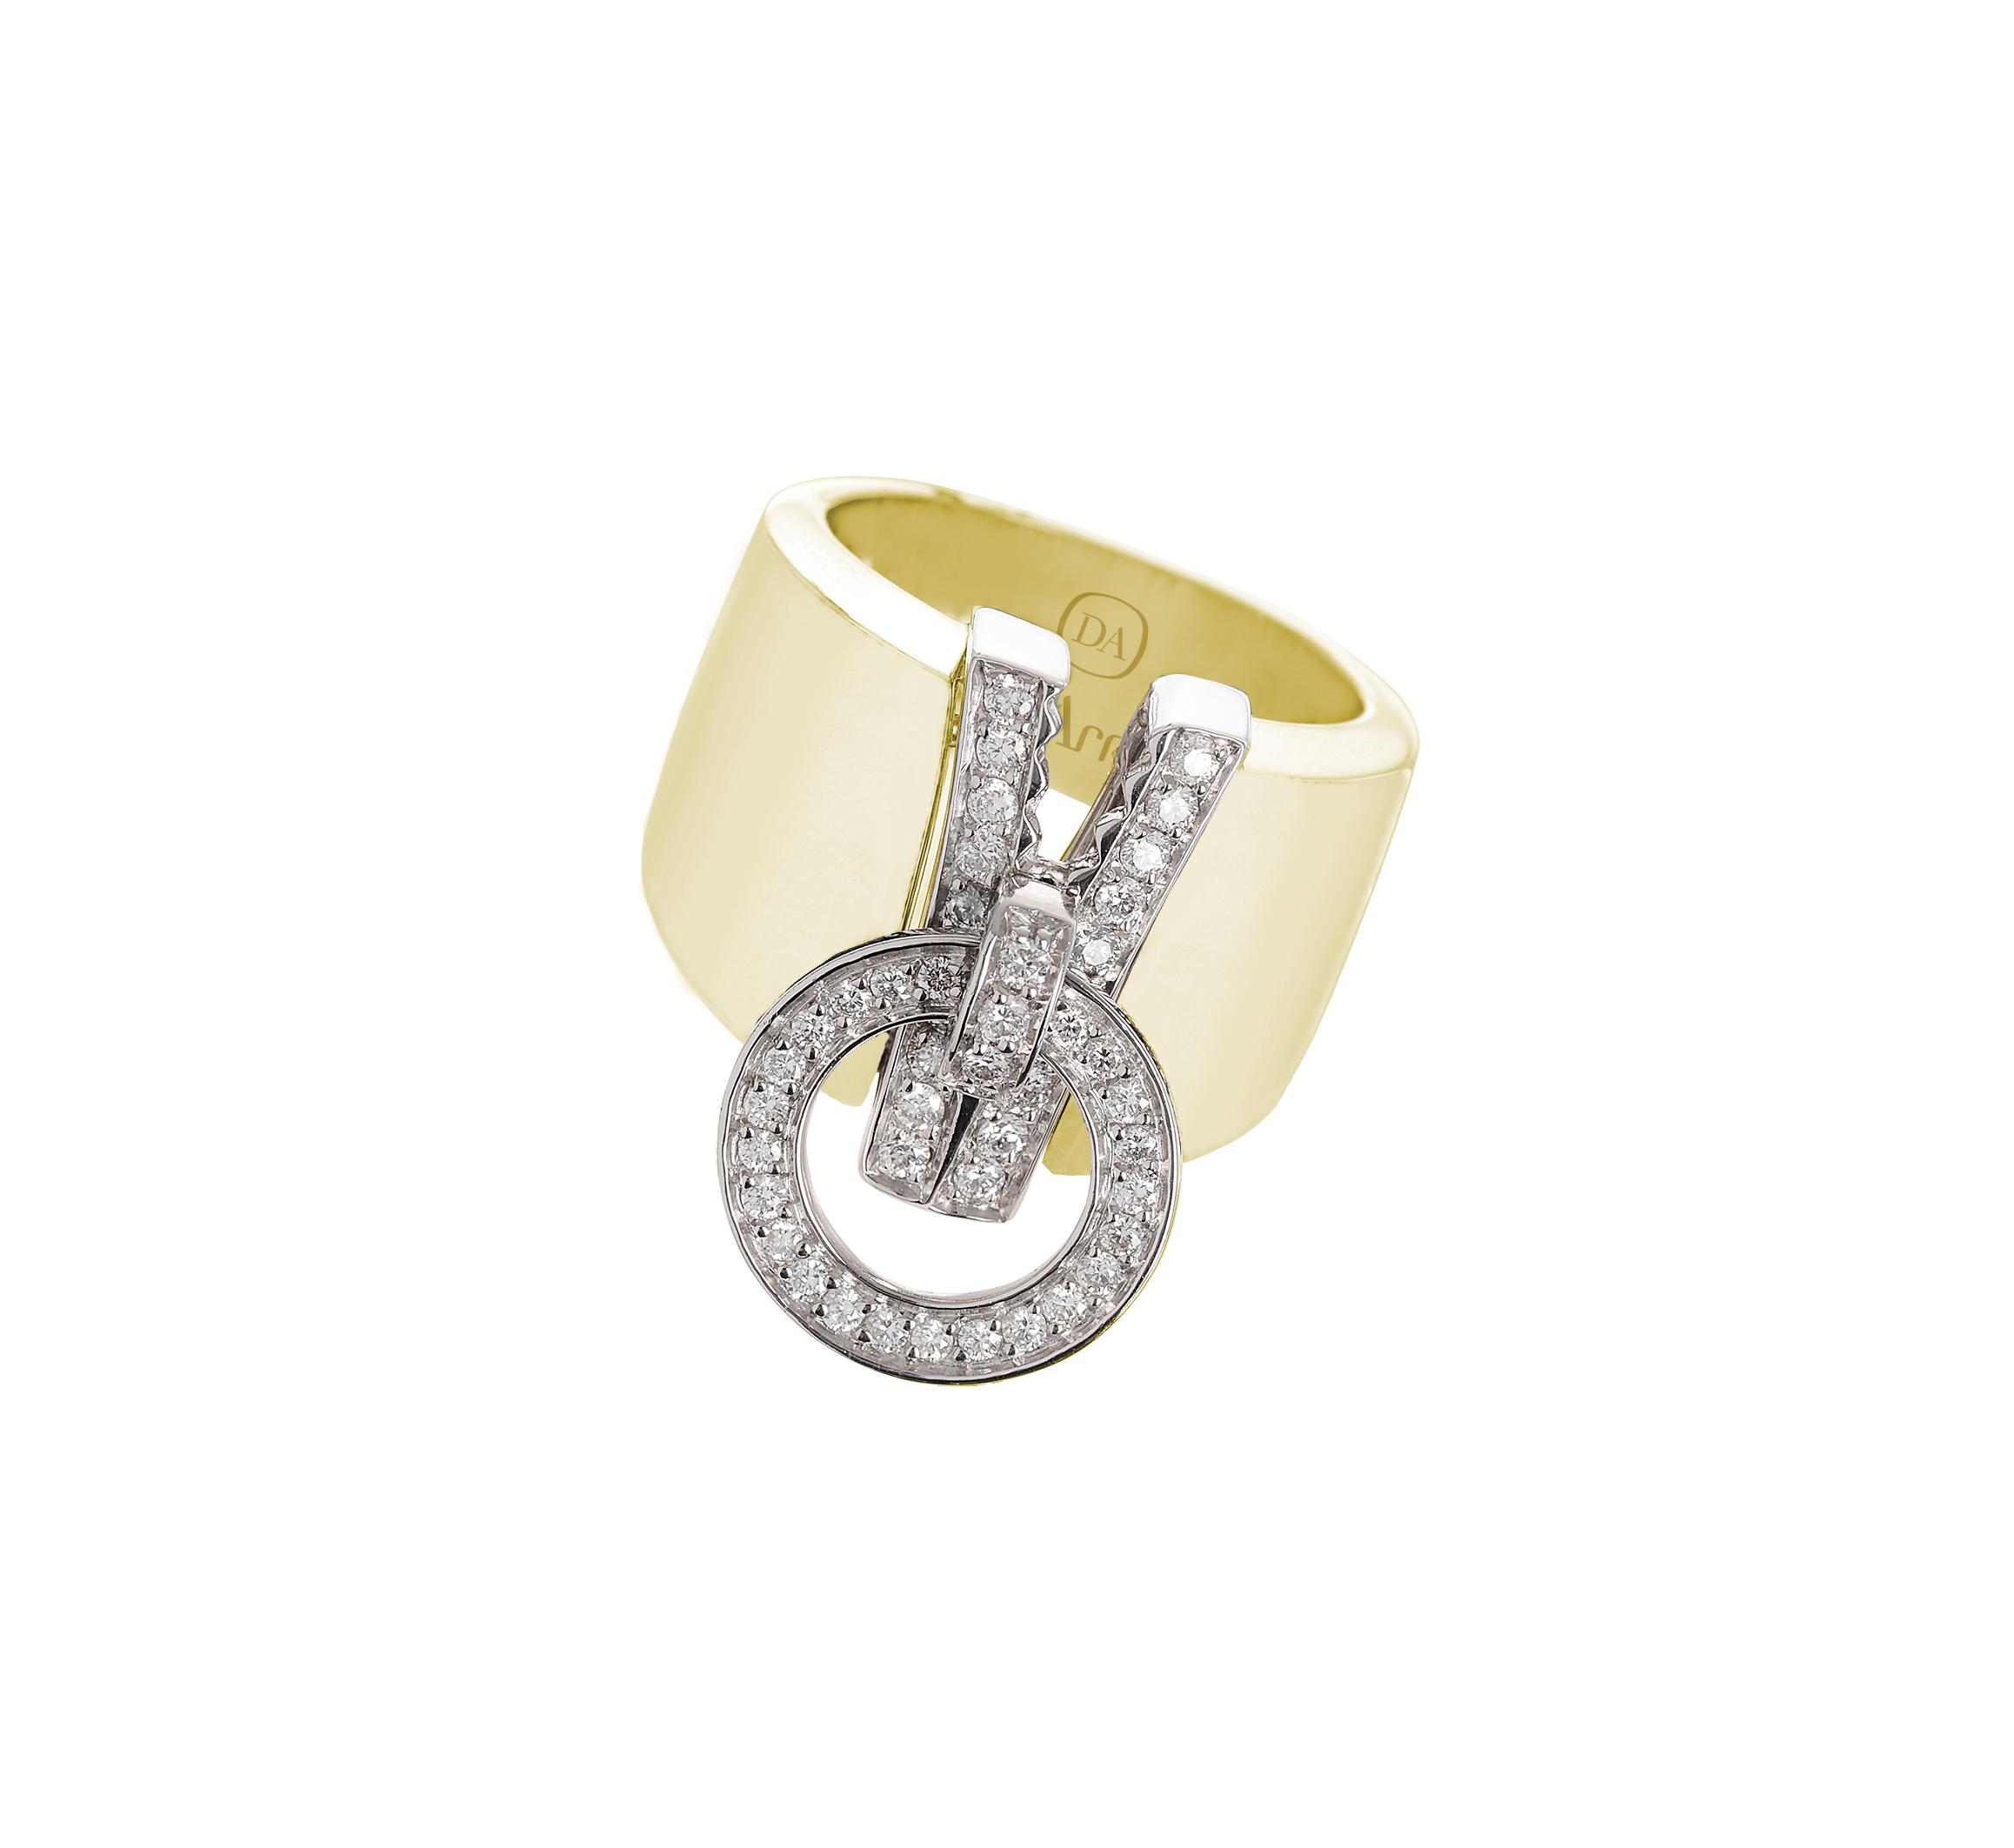 Anello in oro giallo pallido e diamanti